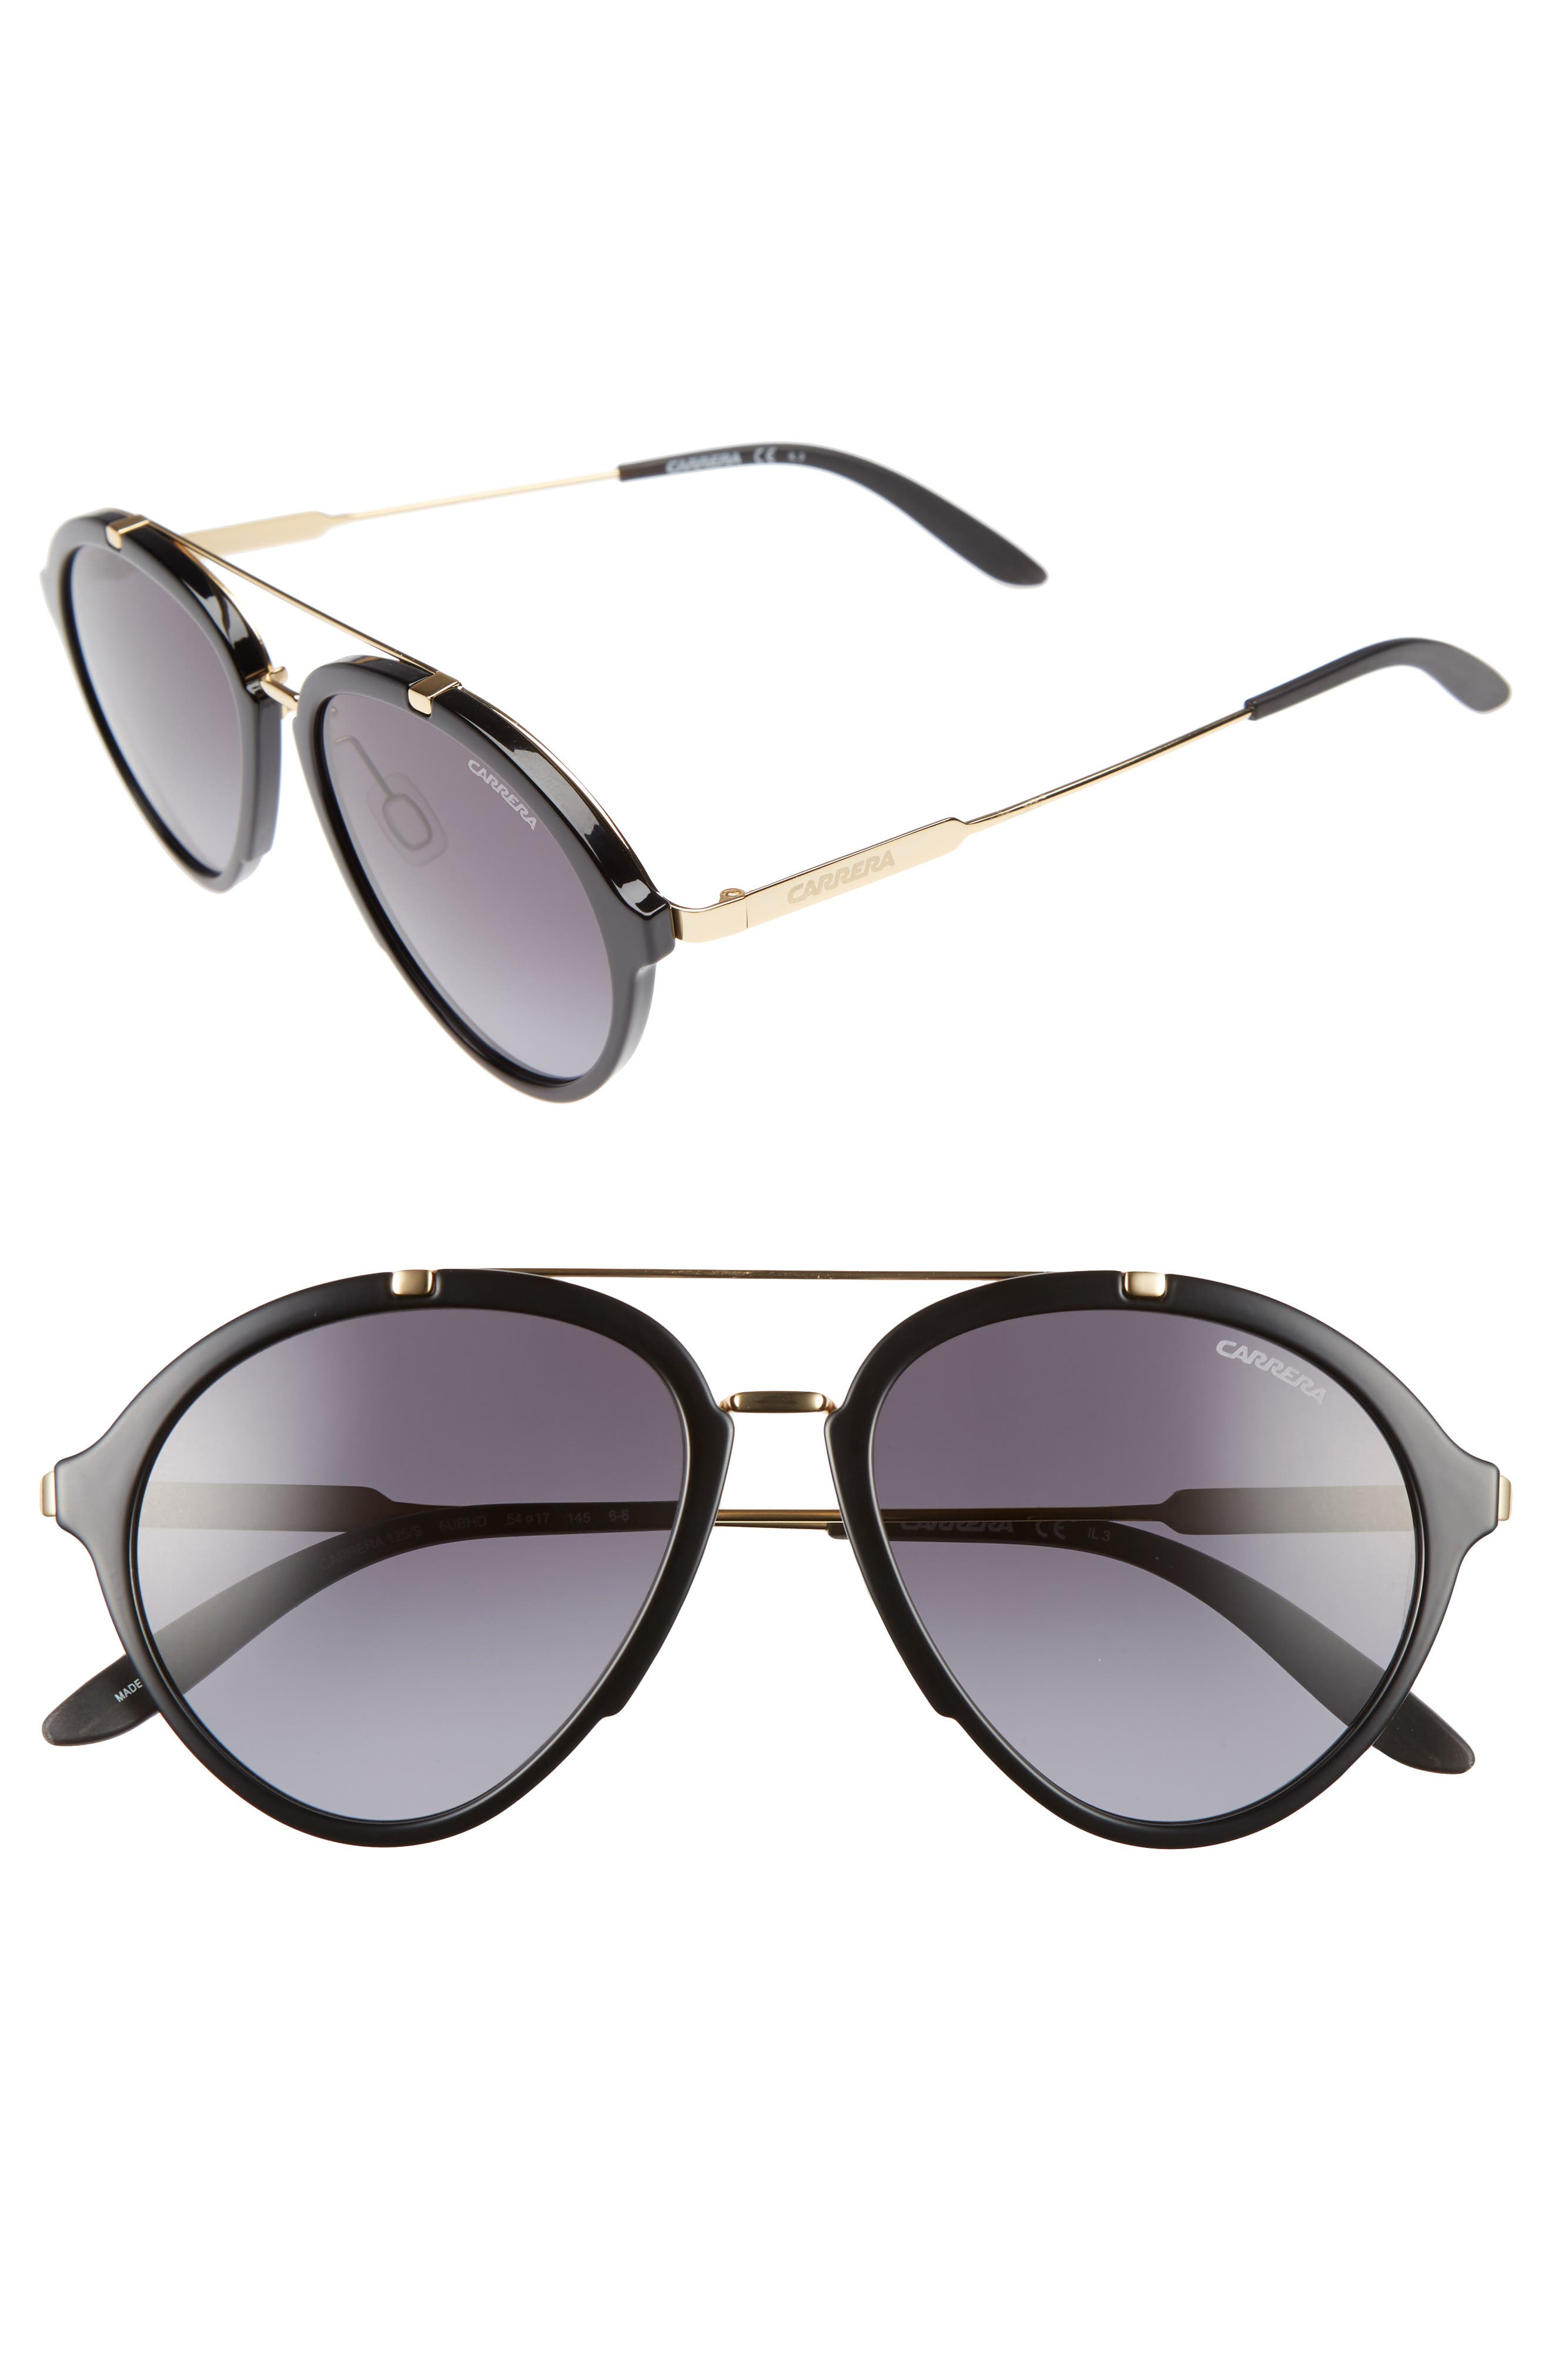 54mm Gradient Aviator Sunglasses,                         Main,                         color, Shiny Black Gold